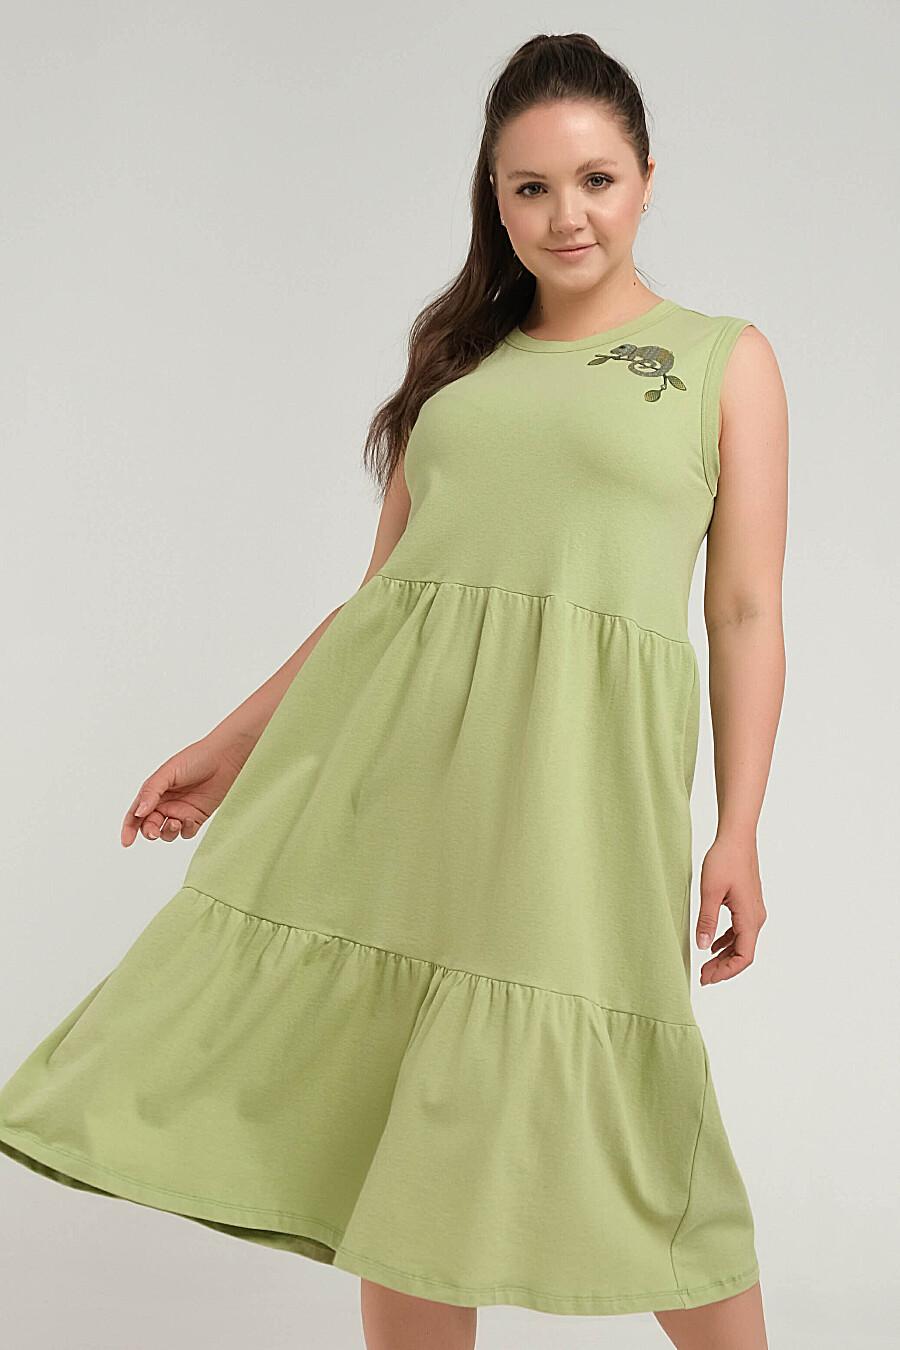 Сарафан ODEVAITE (665970), купить в Moyo.moda